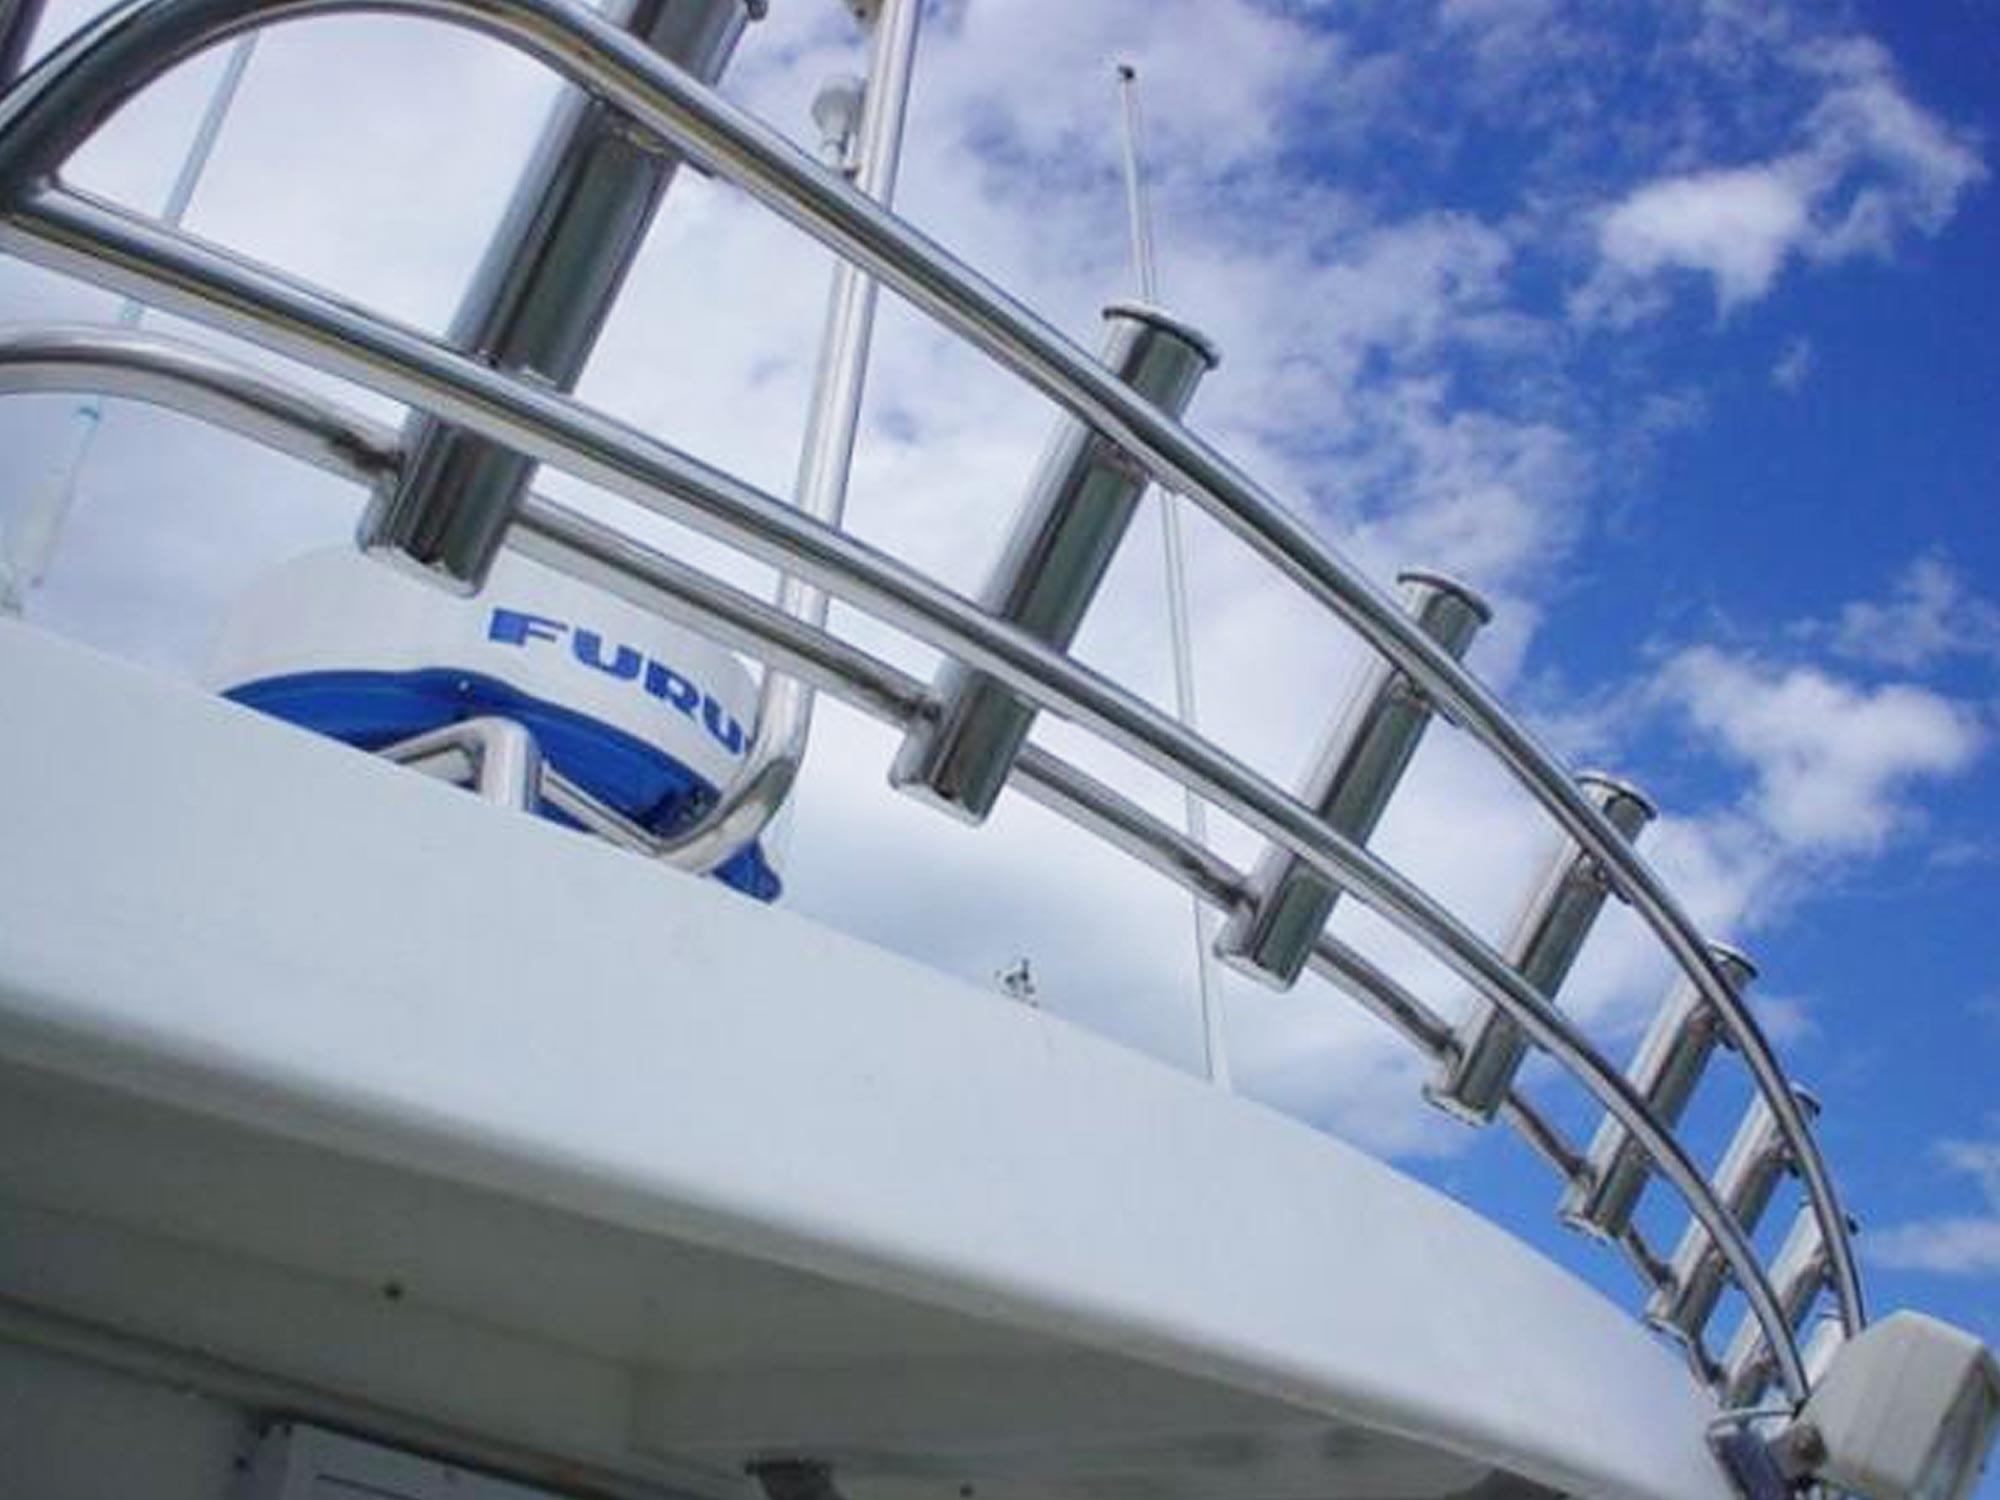 img-architectural-general-danks-boat